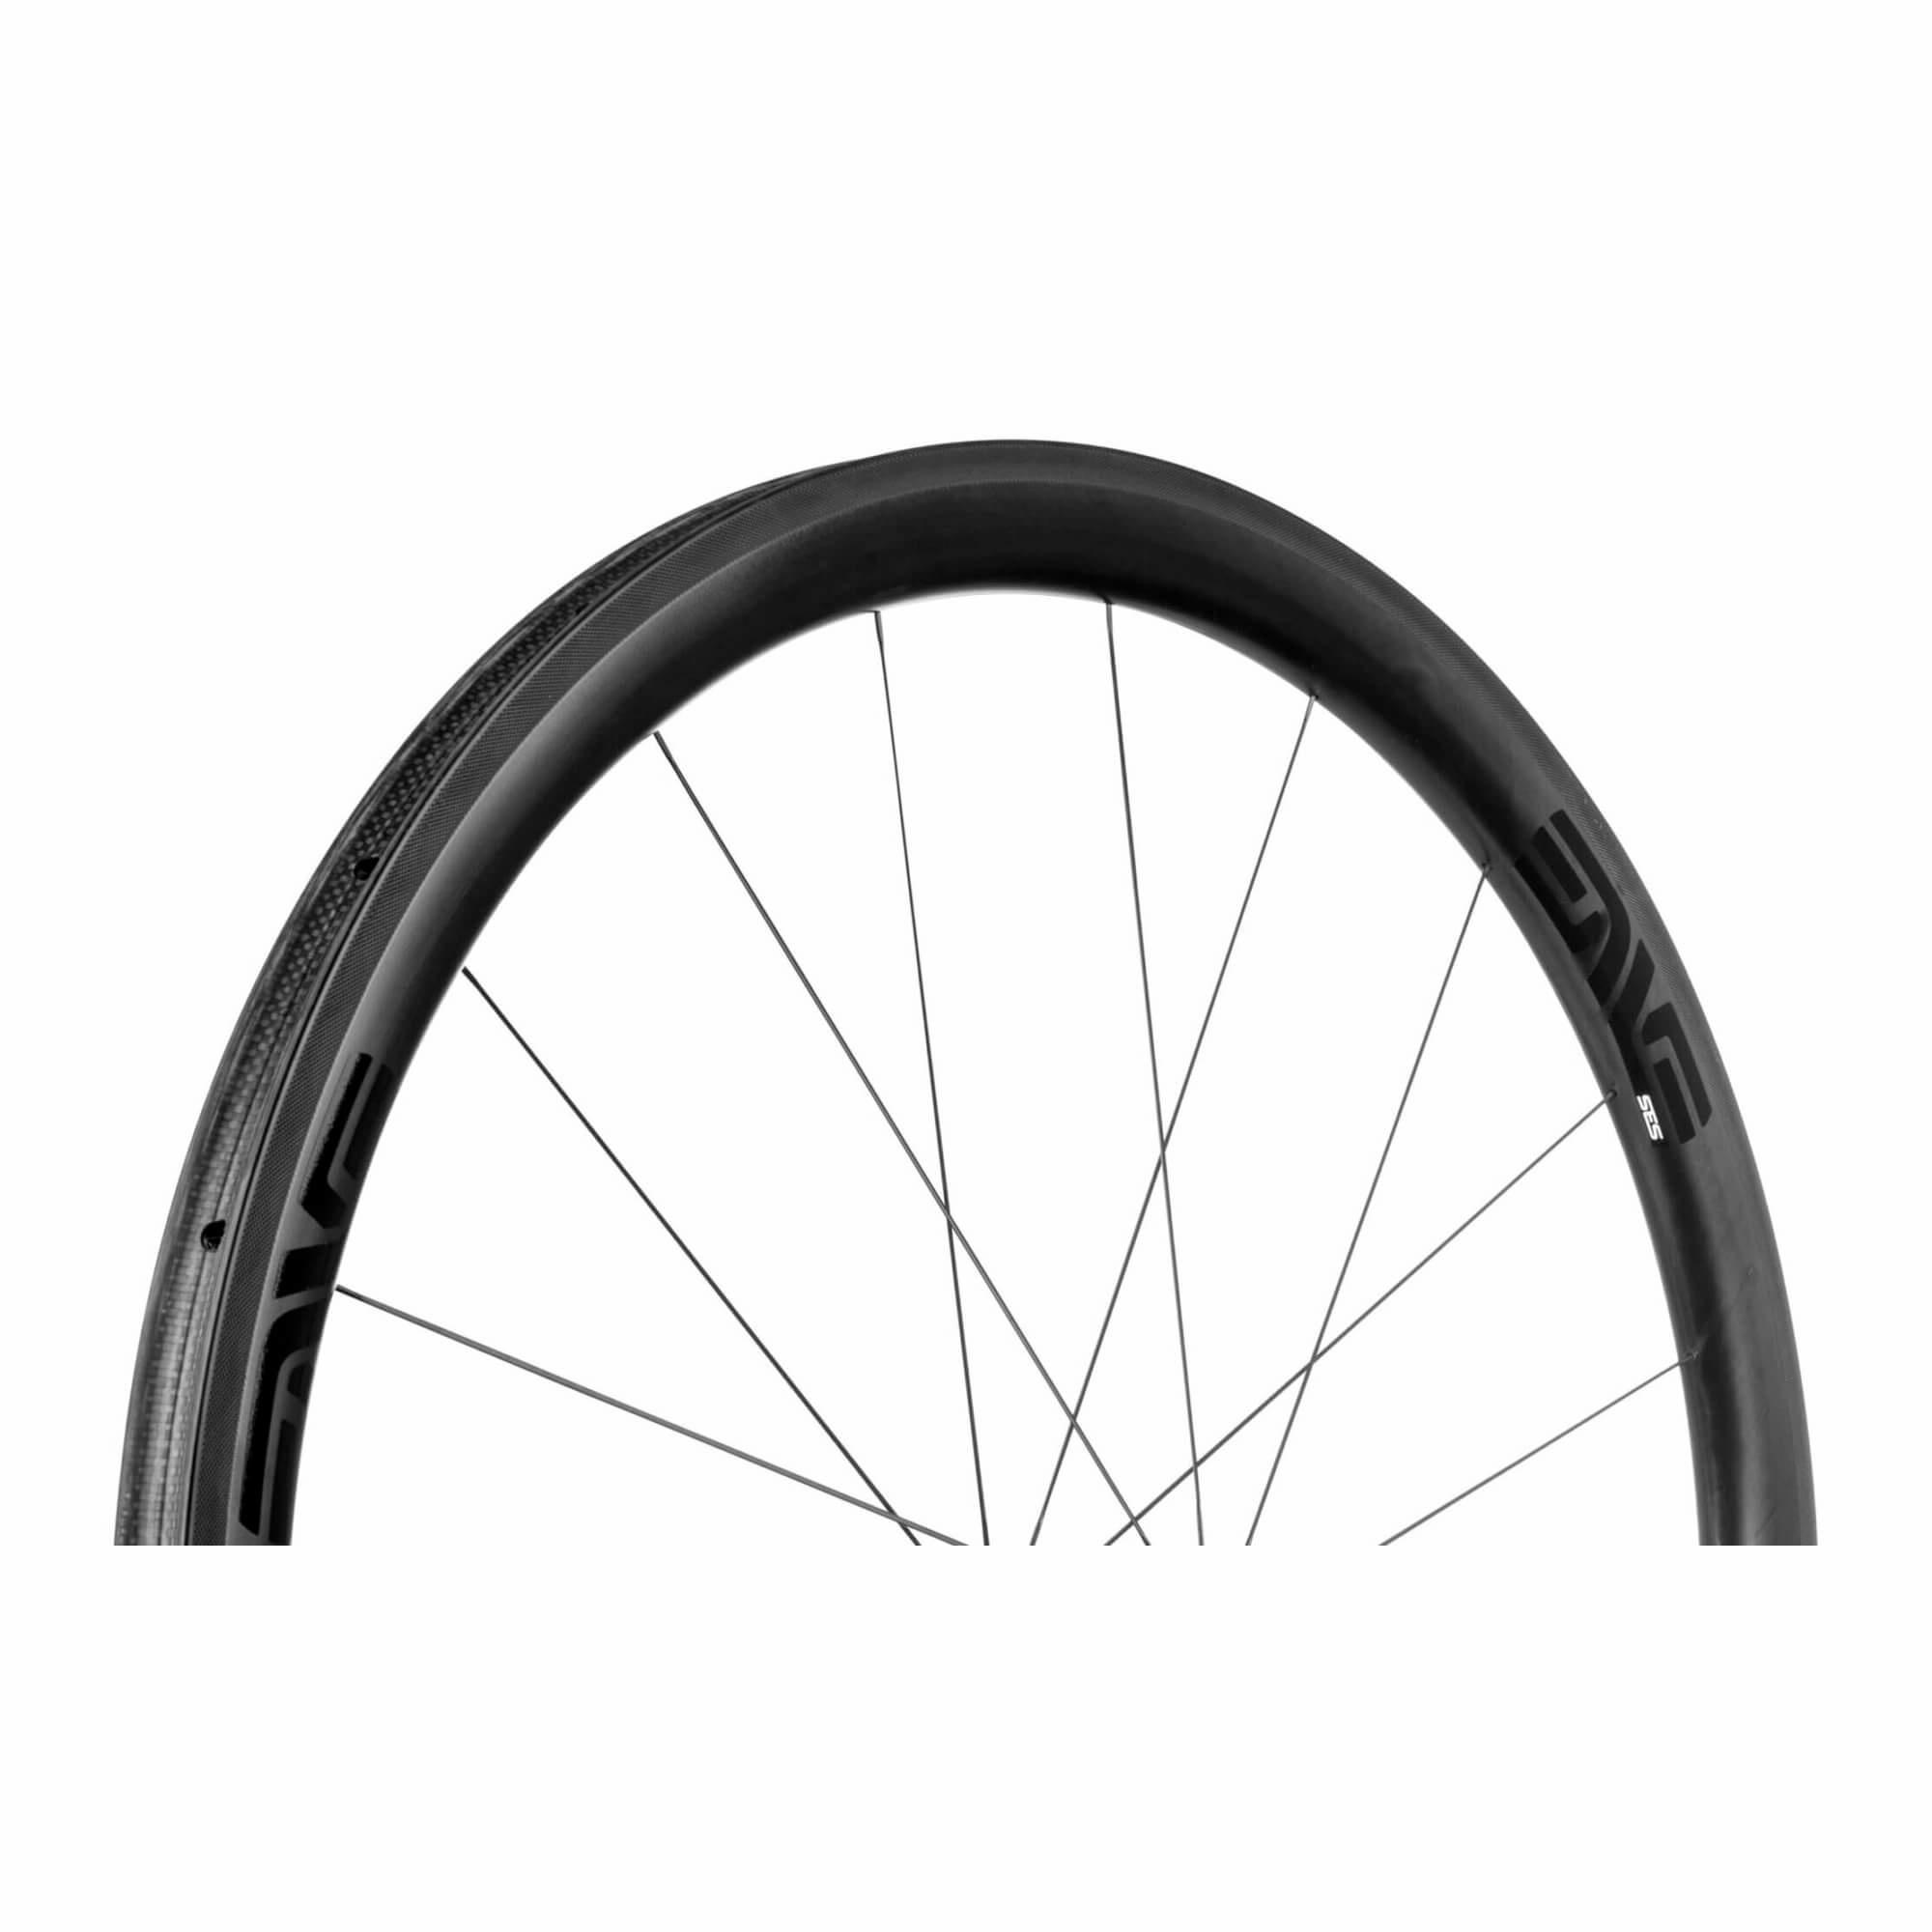 Wheelset SES 3.4C TL-4